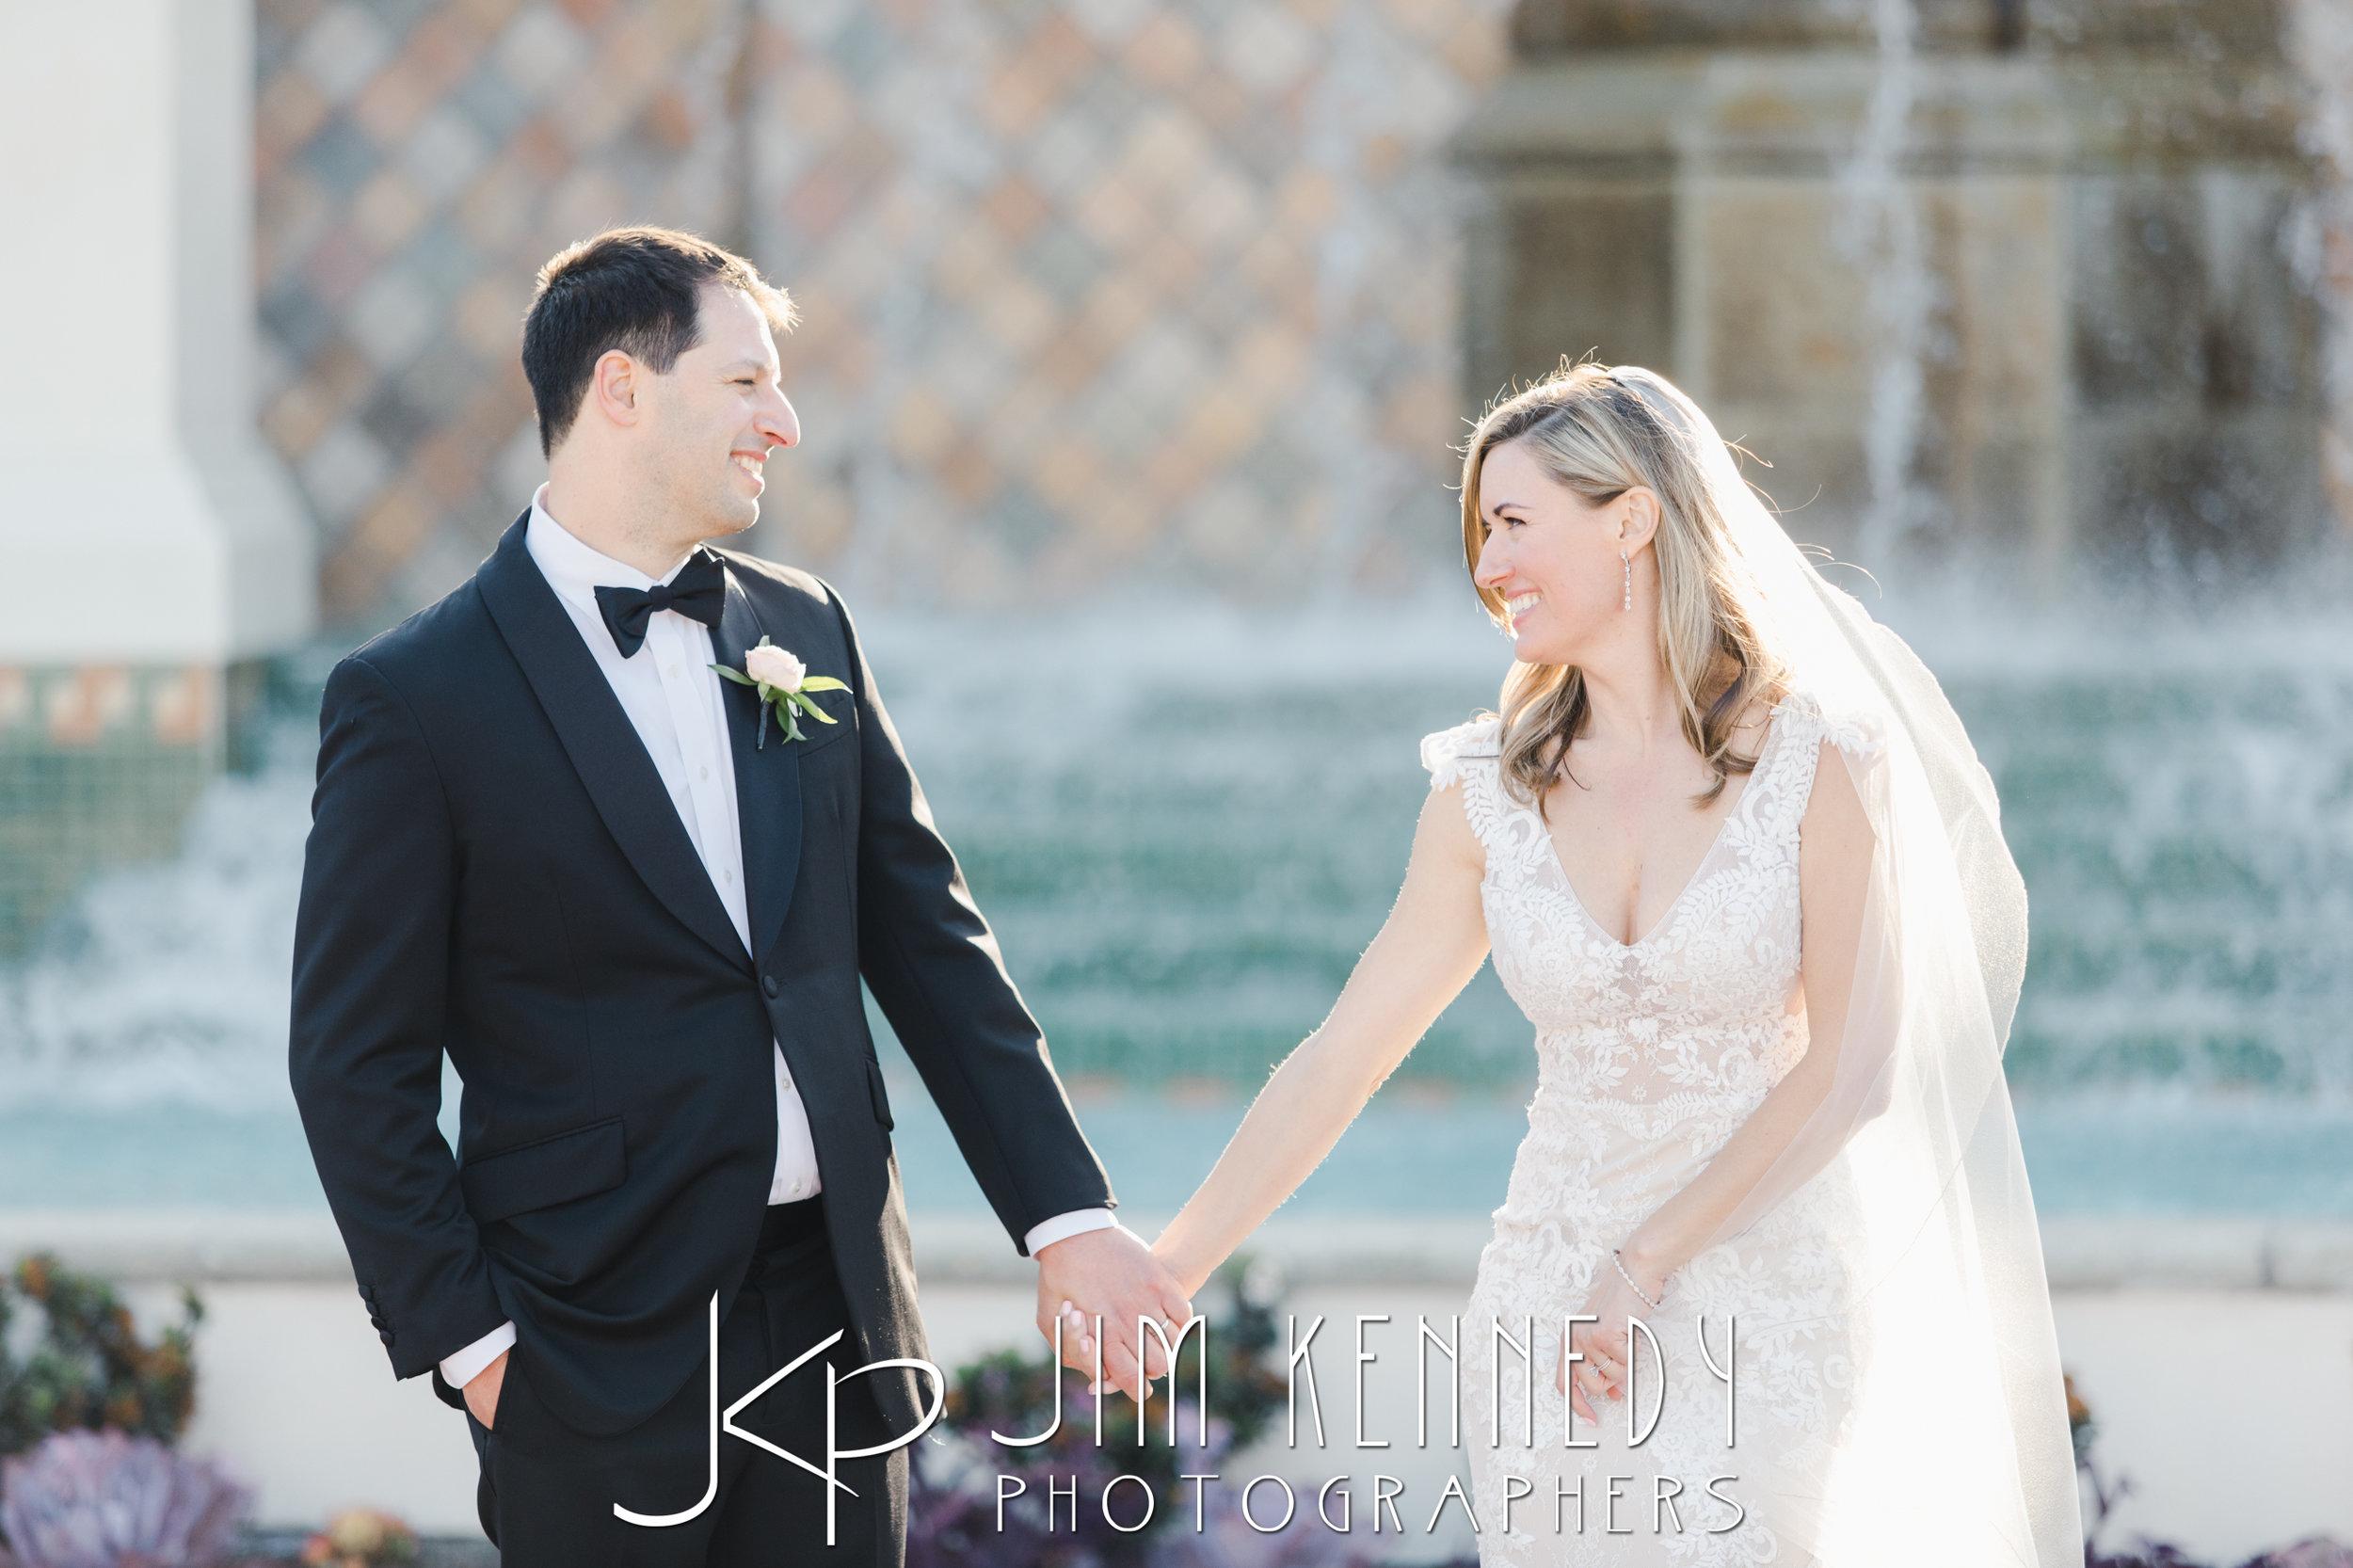 monarch-beach-resort-wedding-JKP_0156.JPG